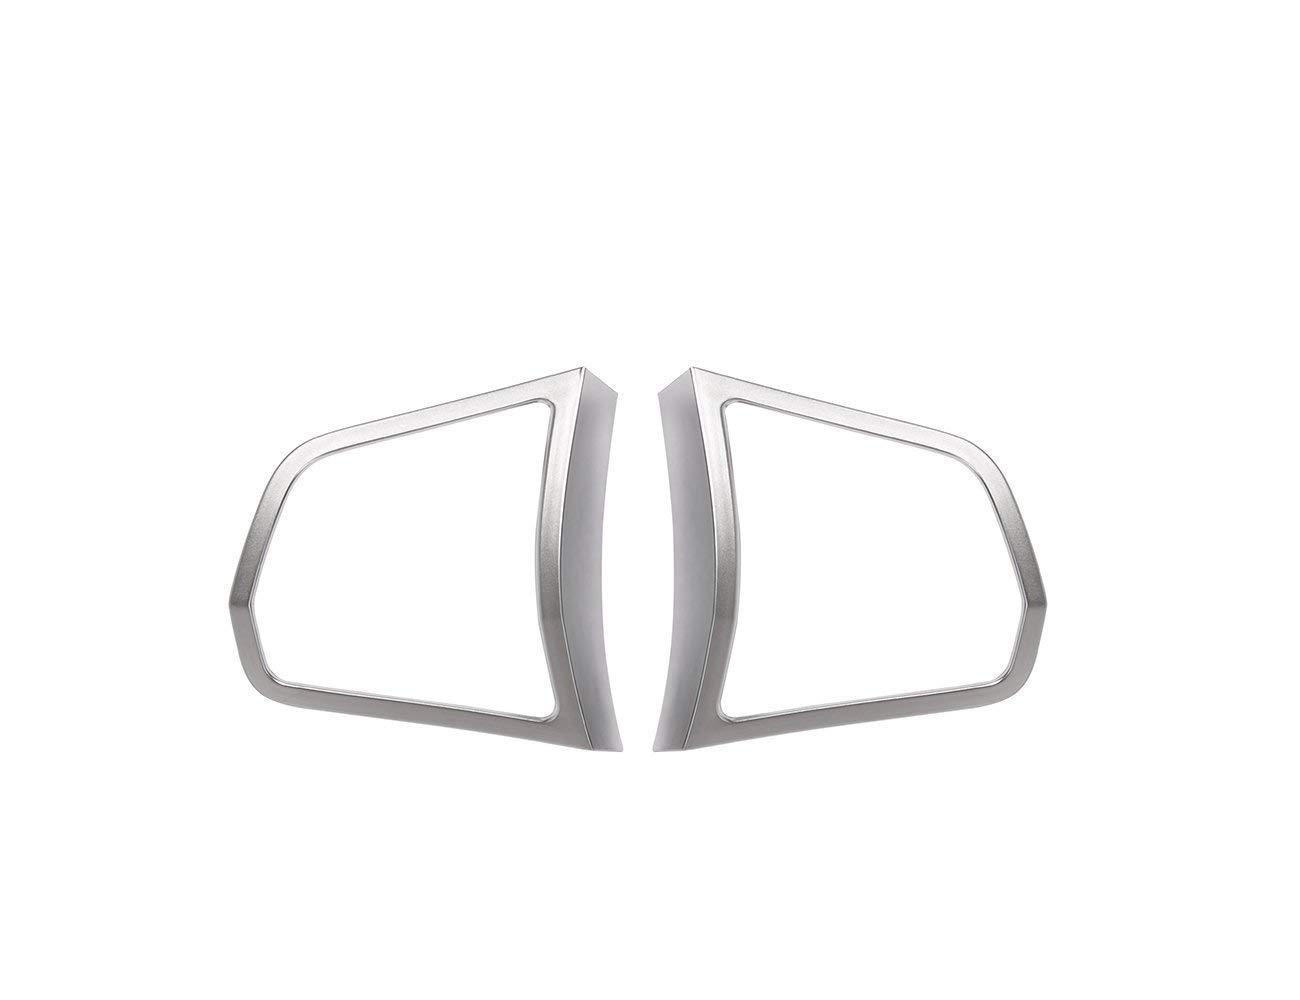 Interior Auto Fahrzeug Zubehö r, fü r 5 7 Series f10 520 525 2011-2017, Lenkrad Knopfleiste Trim ABS Verchromung Silber, 2 Stü ck/Satz ACCEMOD